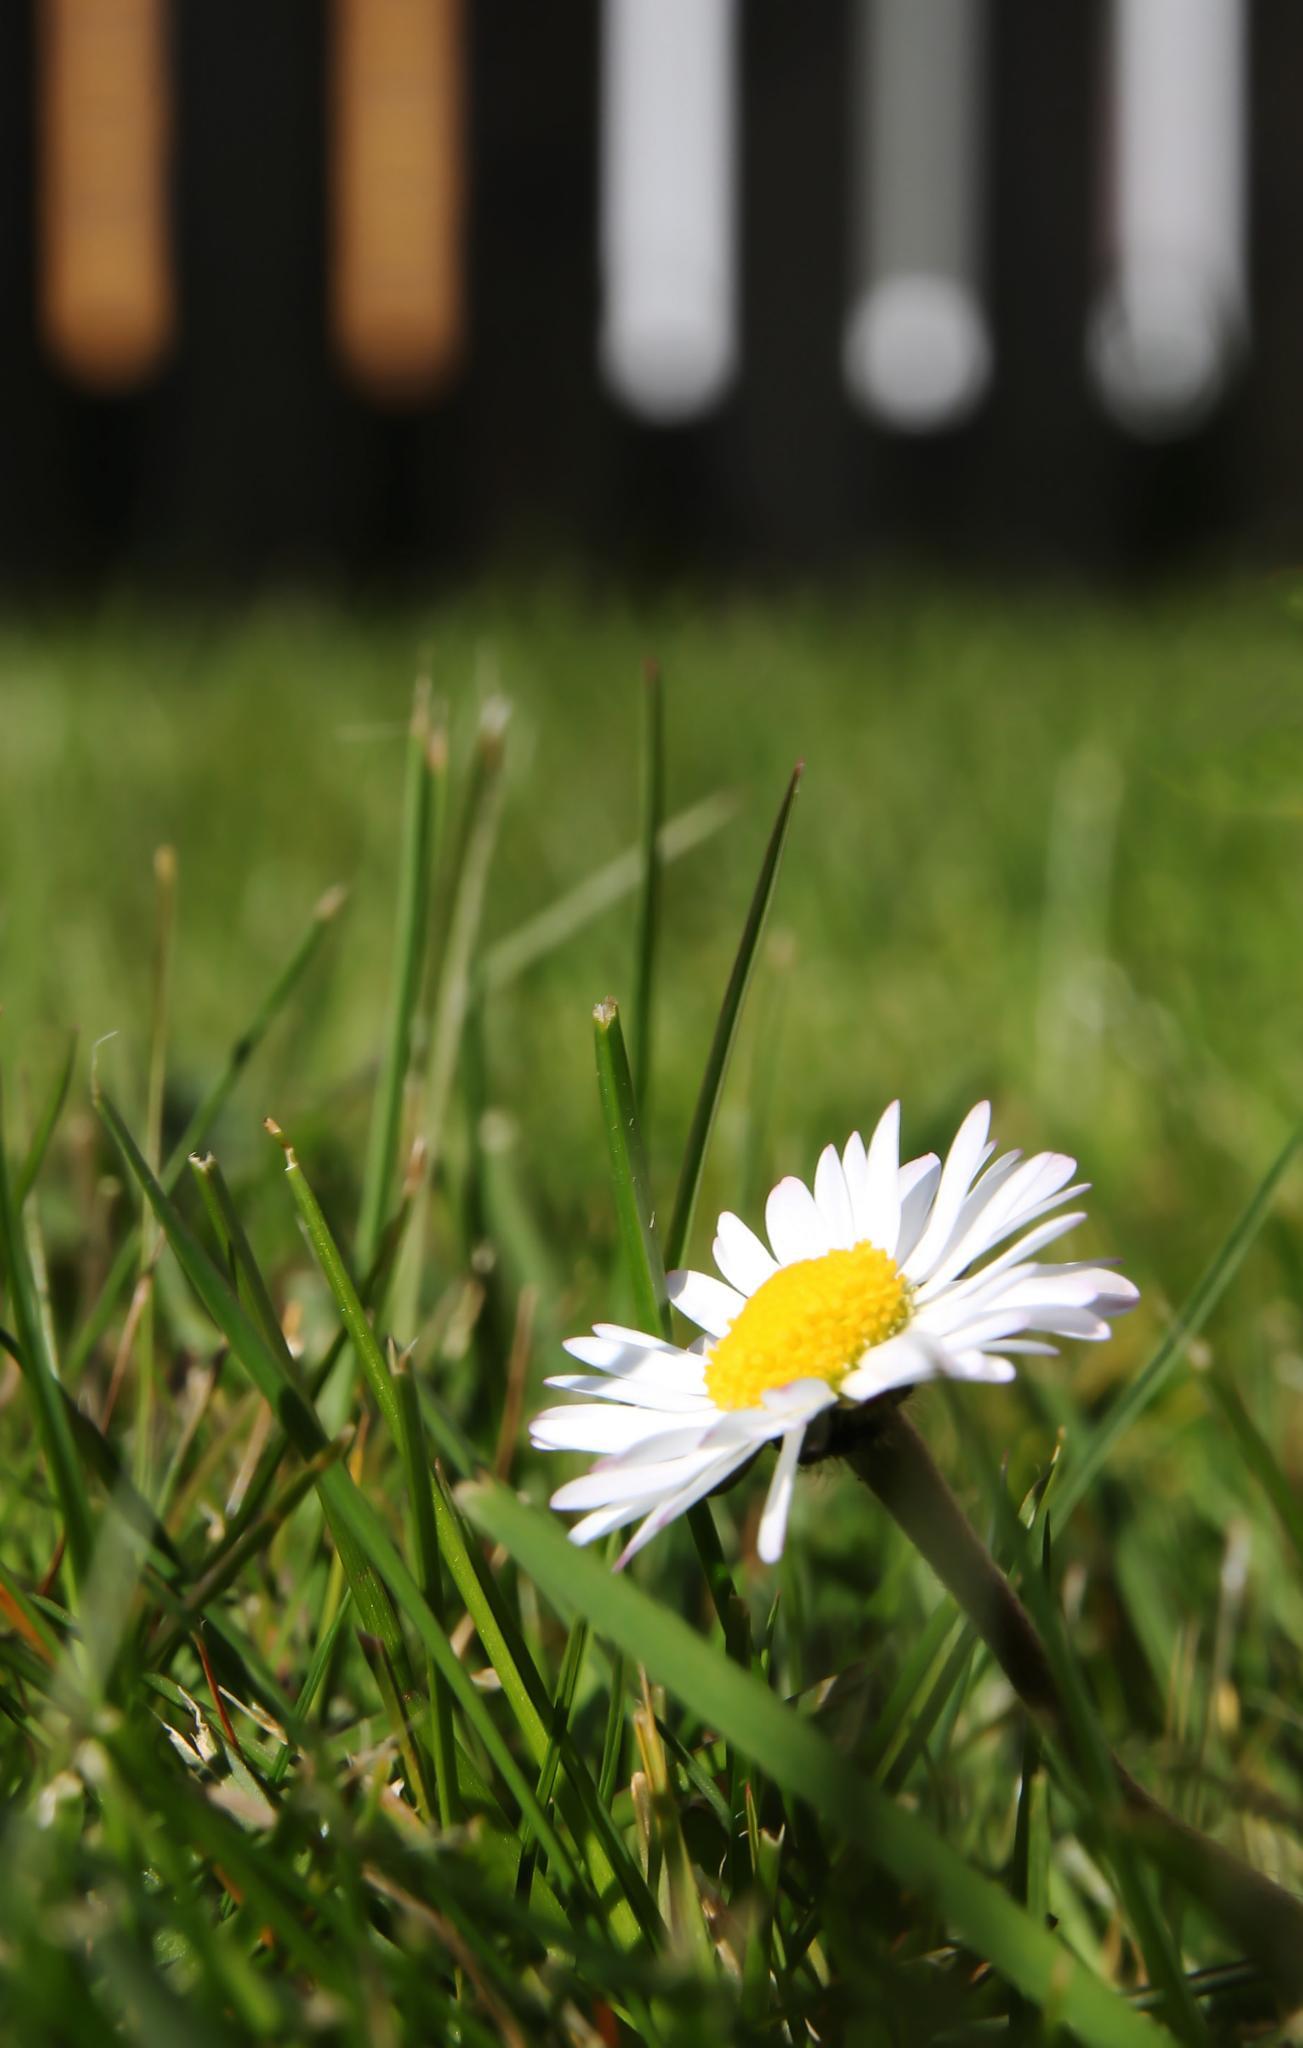 Daisy by KasiaM